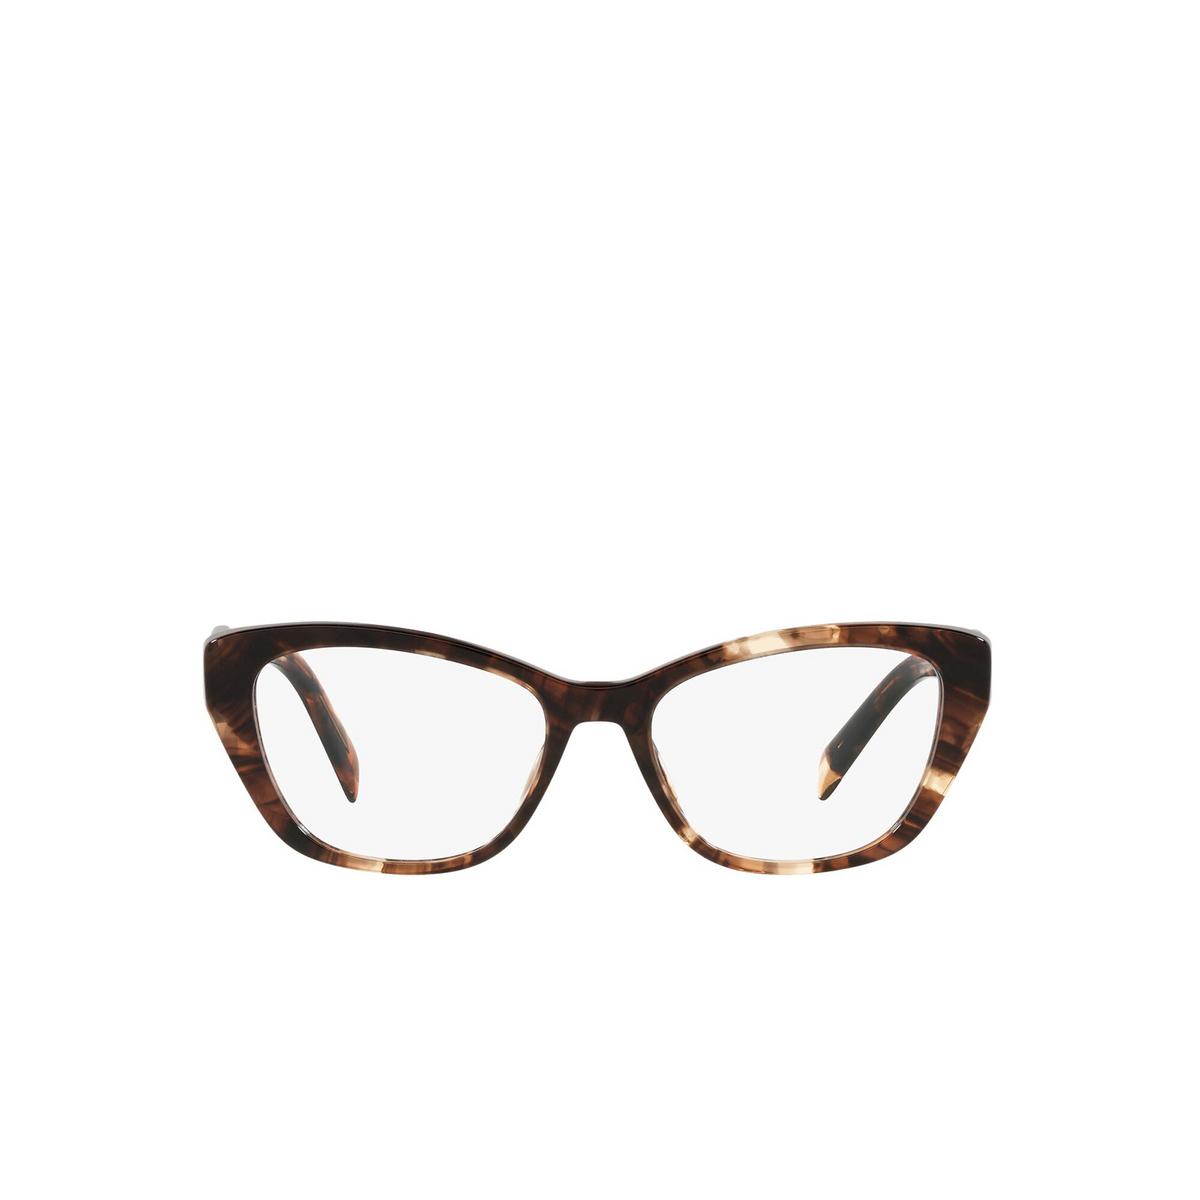 Prada® Cat-eye Eyeglasses: PR 19WV color Caramel Tortoise 07R1O1 - front view.